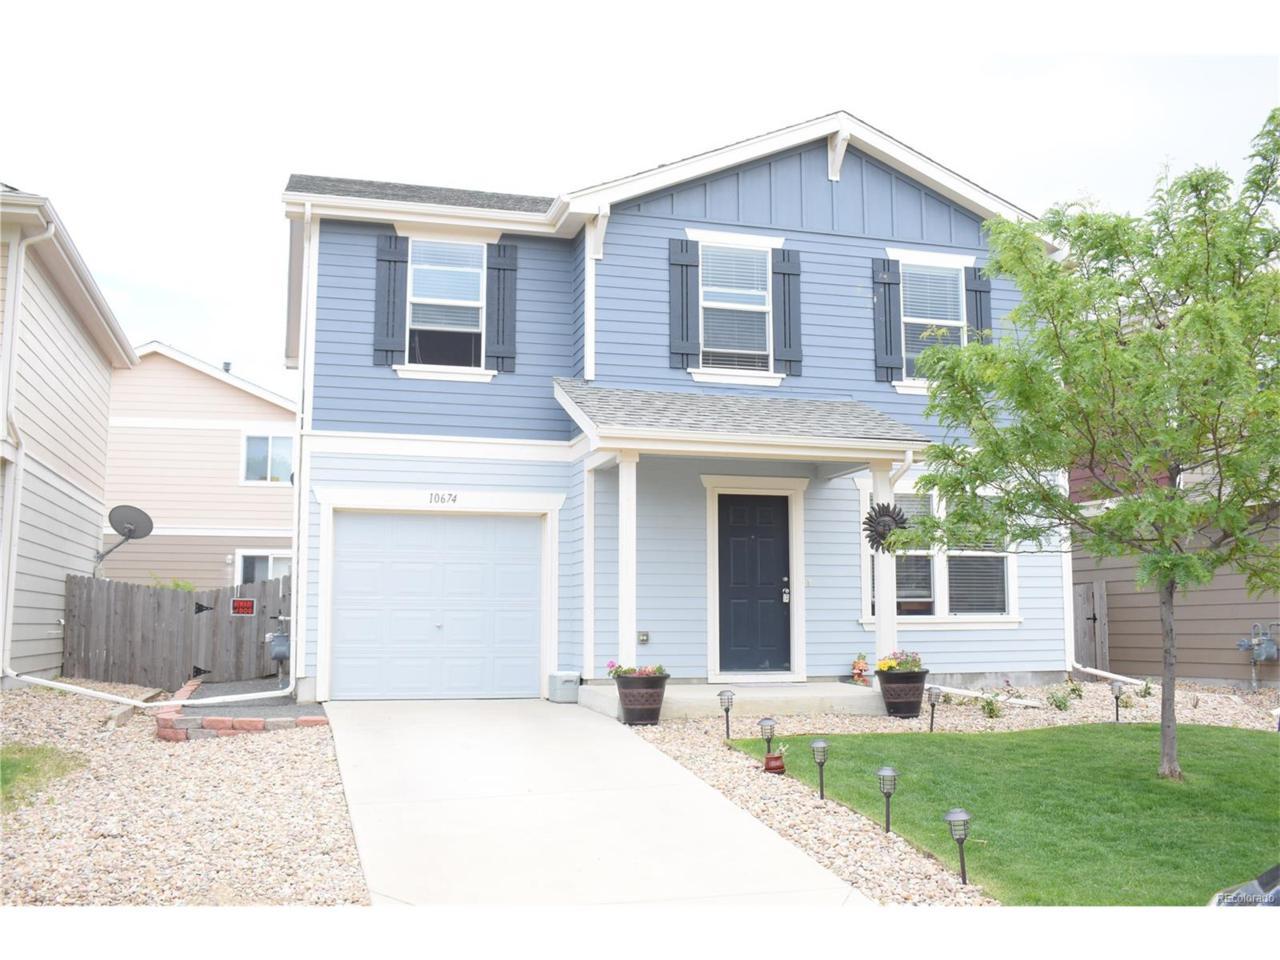 10674 Upper Ridge Road, Longmont, CO 80504 (MLS #8846255) :: 8z Real Estate